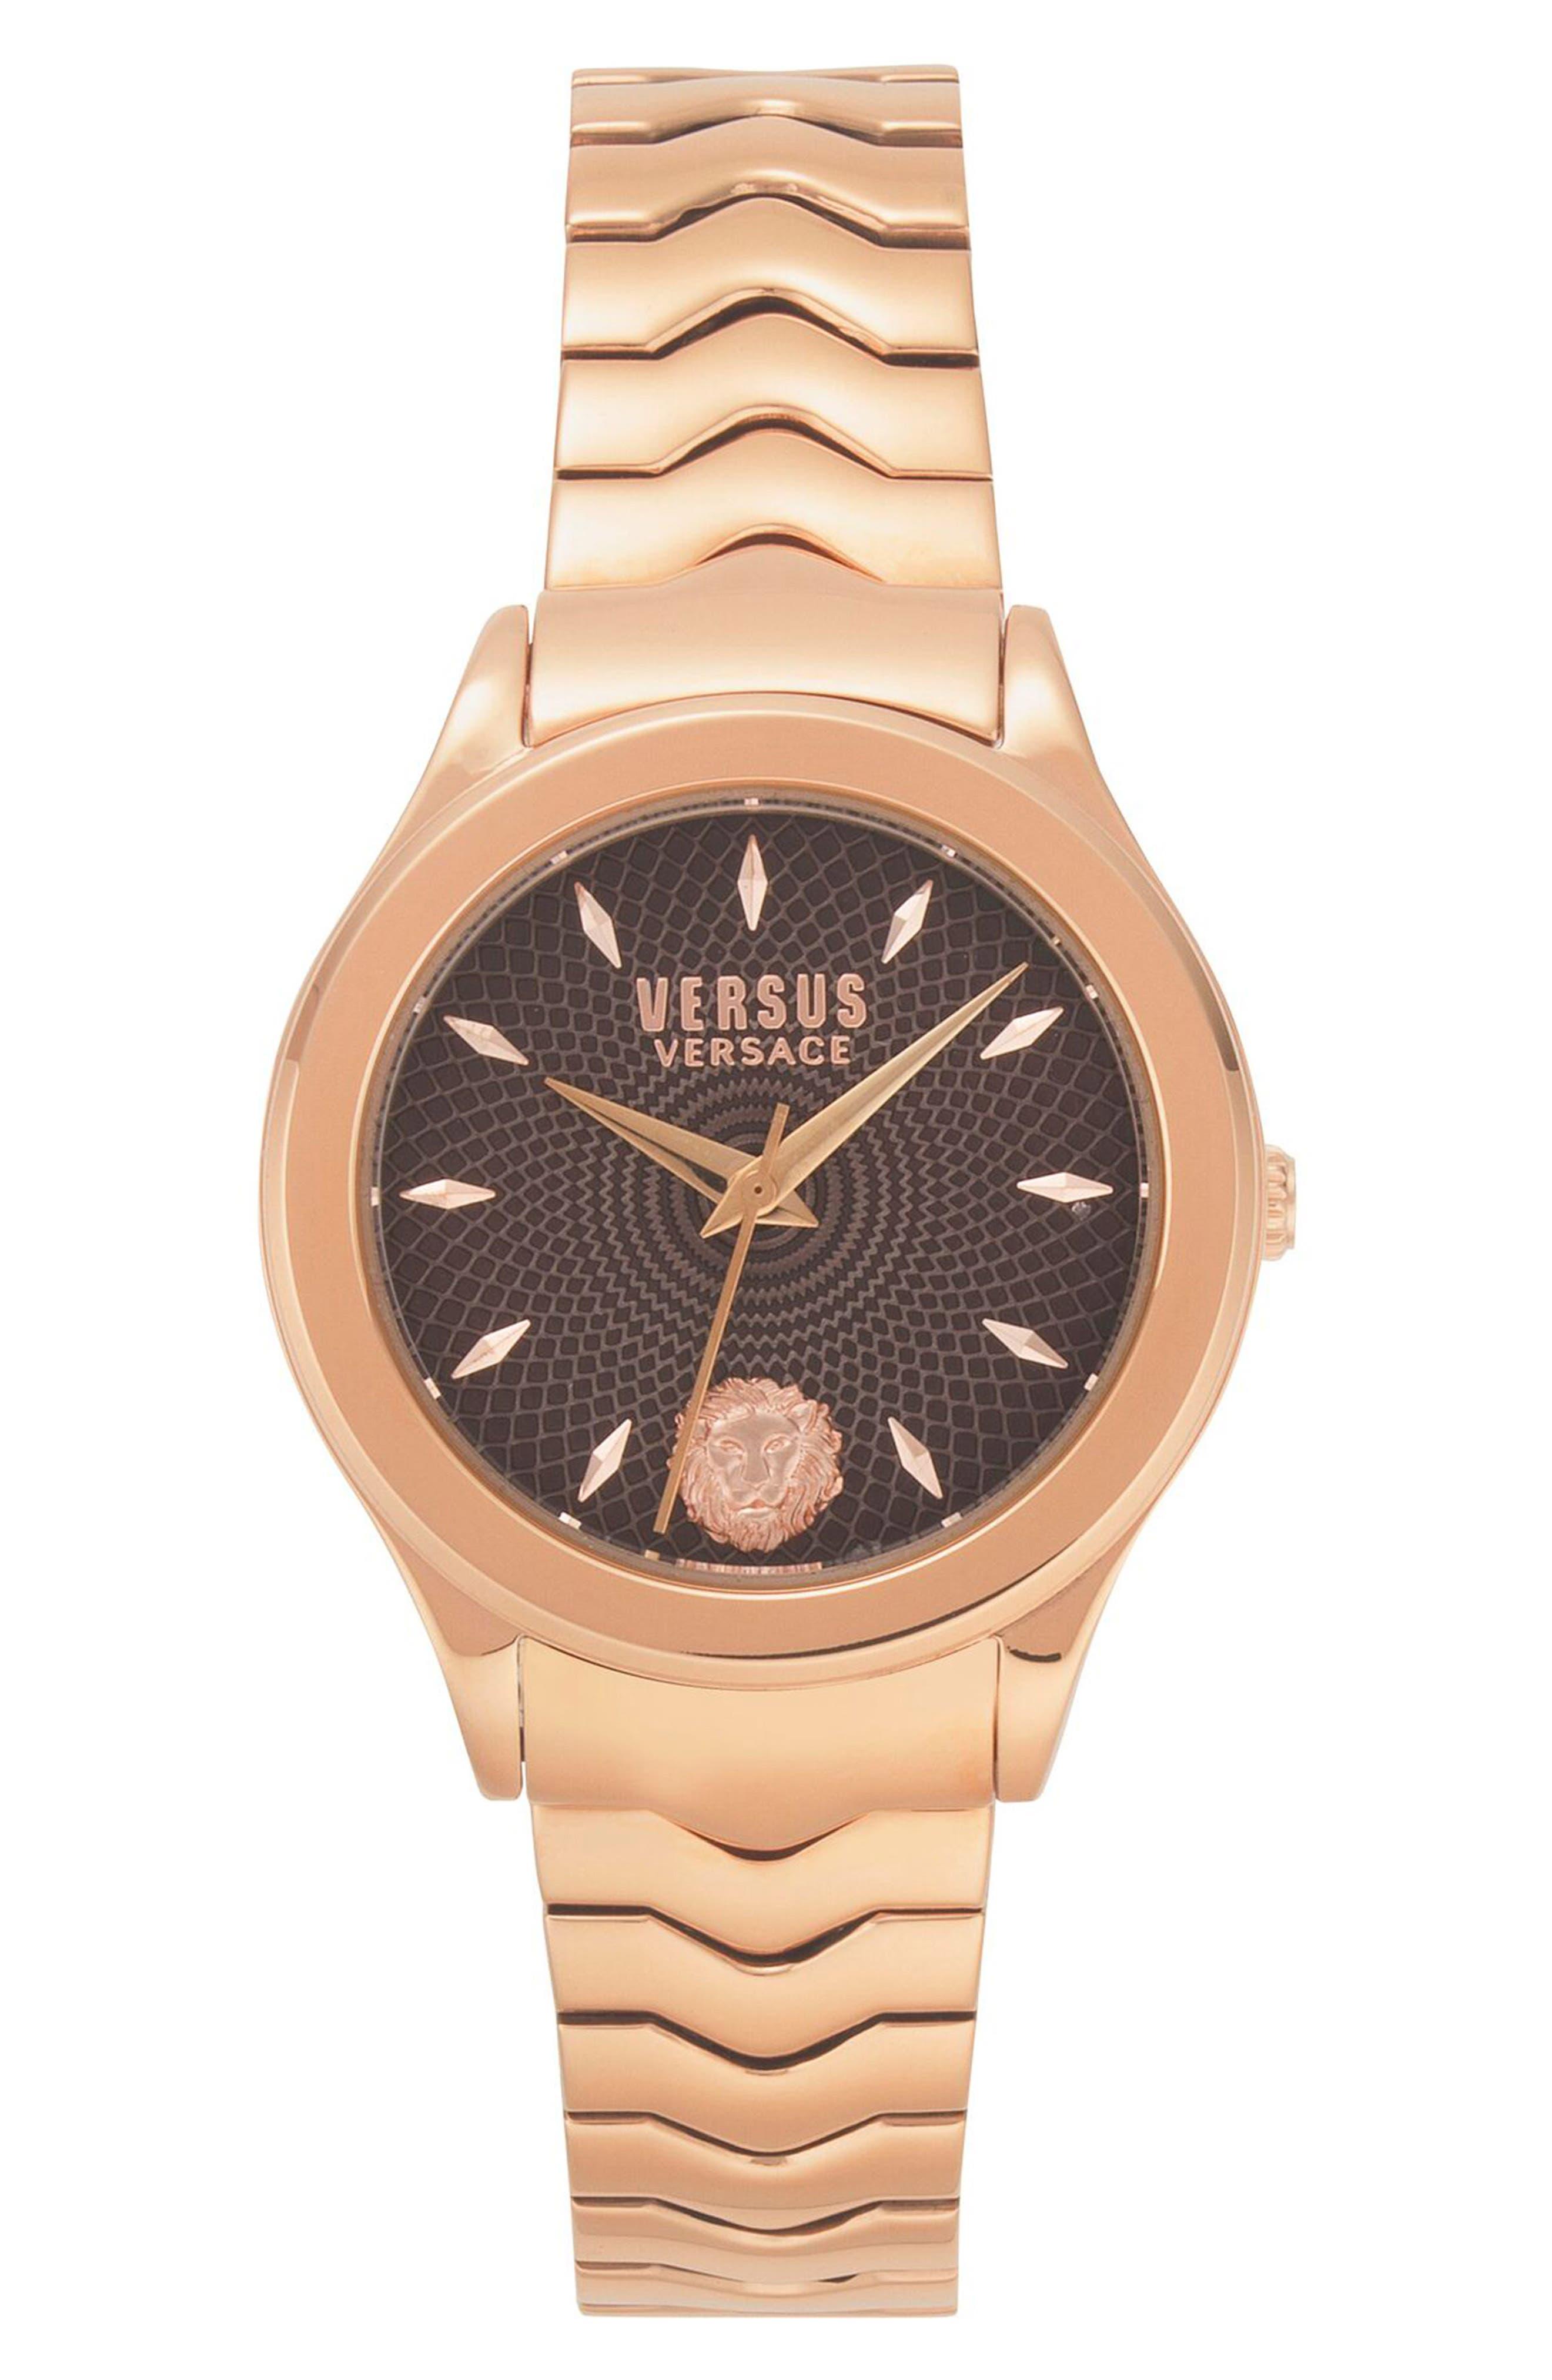 VERSUS VERSACE Mount Pleasant Bracelet Watch, 34mm, Main, color, ROSE GOLD/ BLACK/ ROSE GOLD